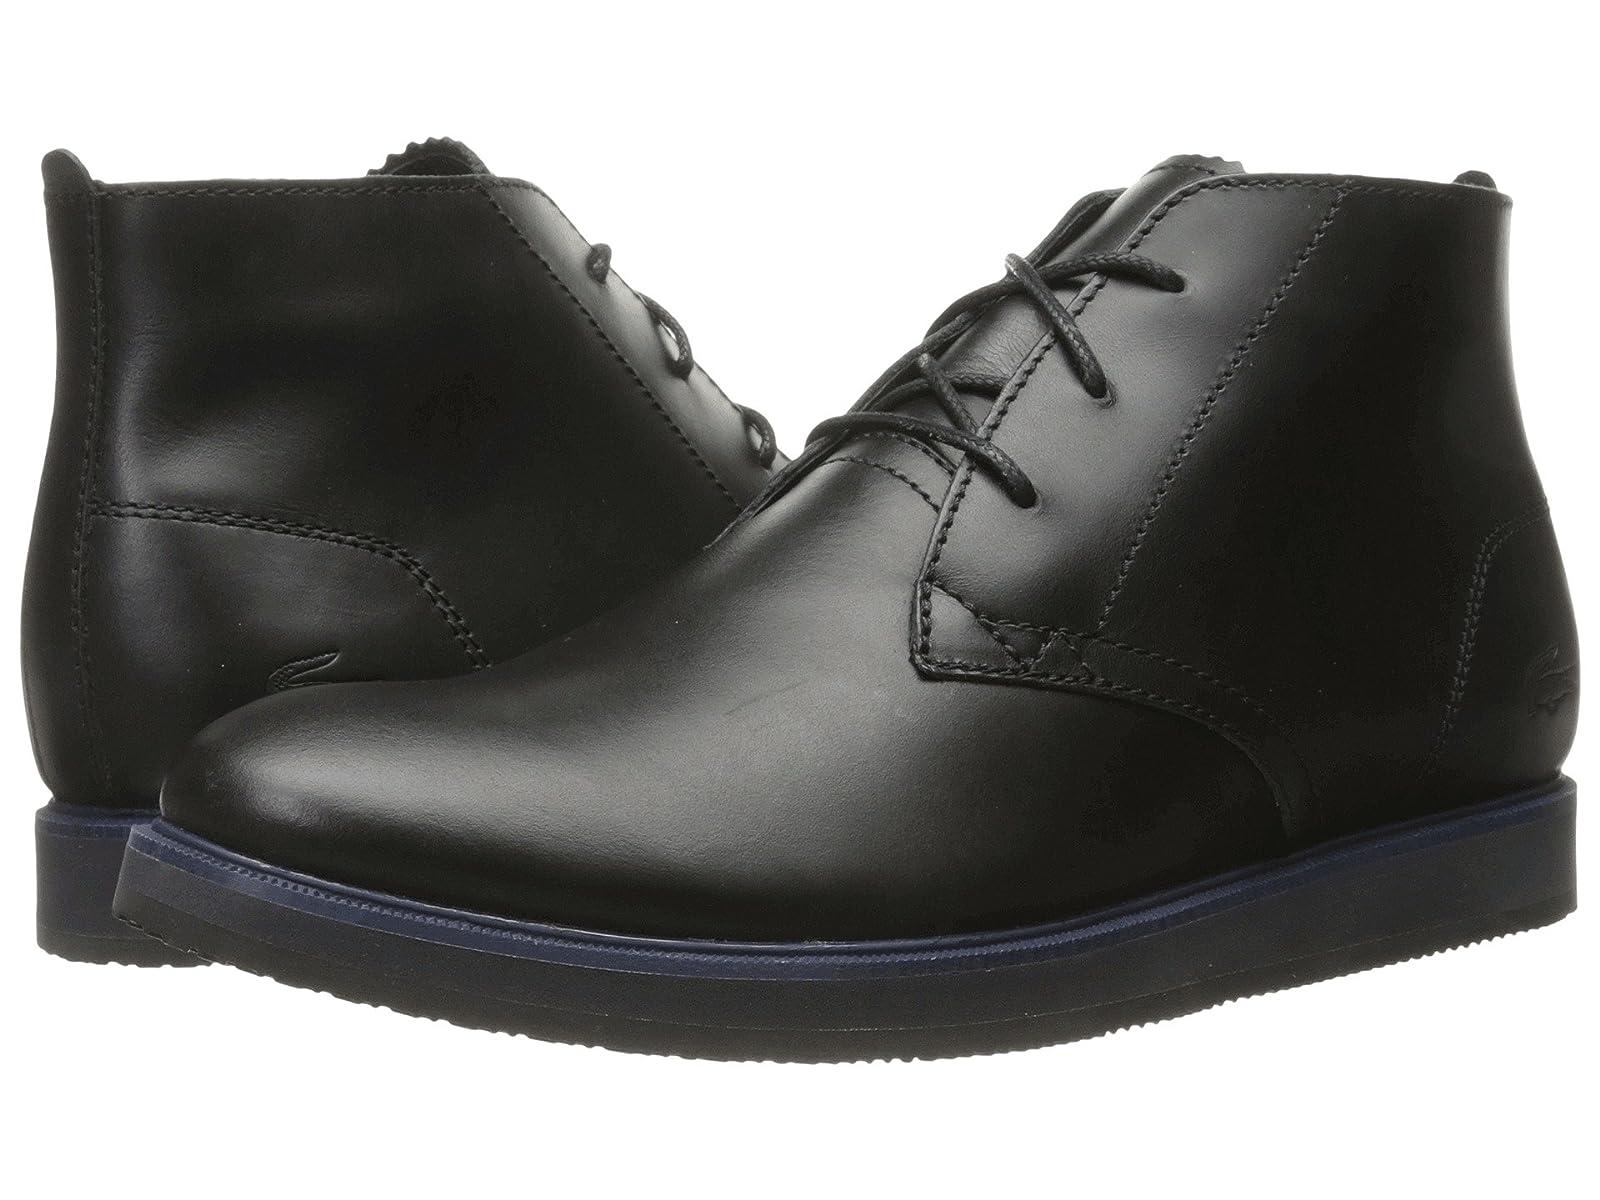 Lacoste Millard Chukka 316 1Cheap and distinctive eye-catching shoes